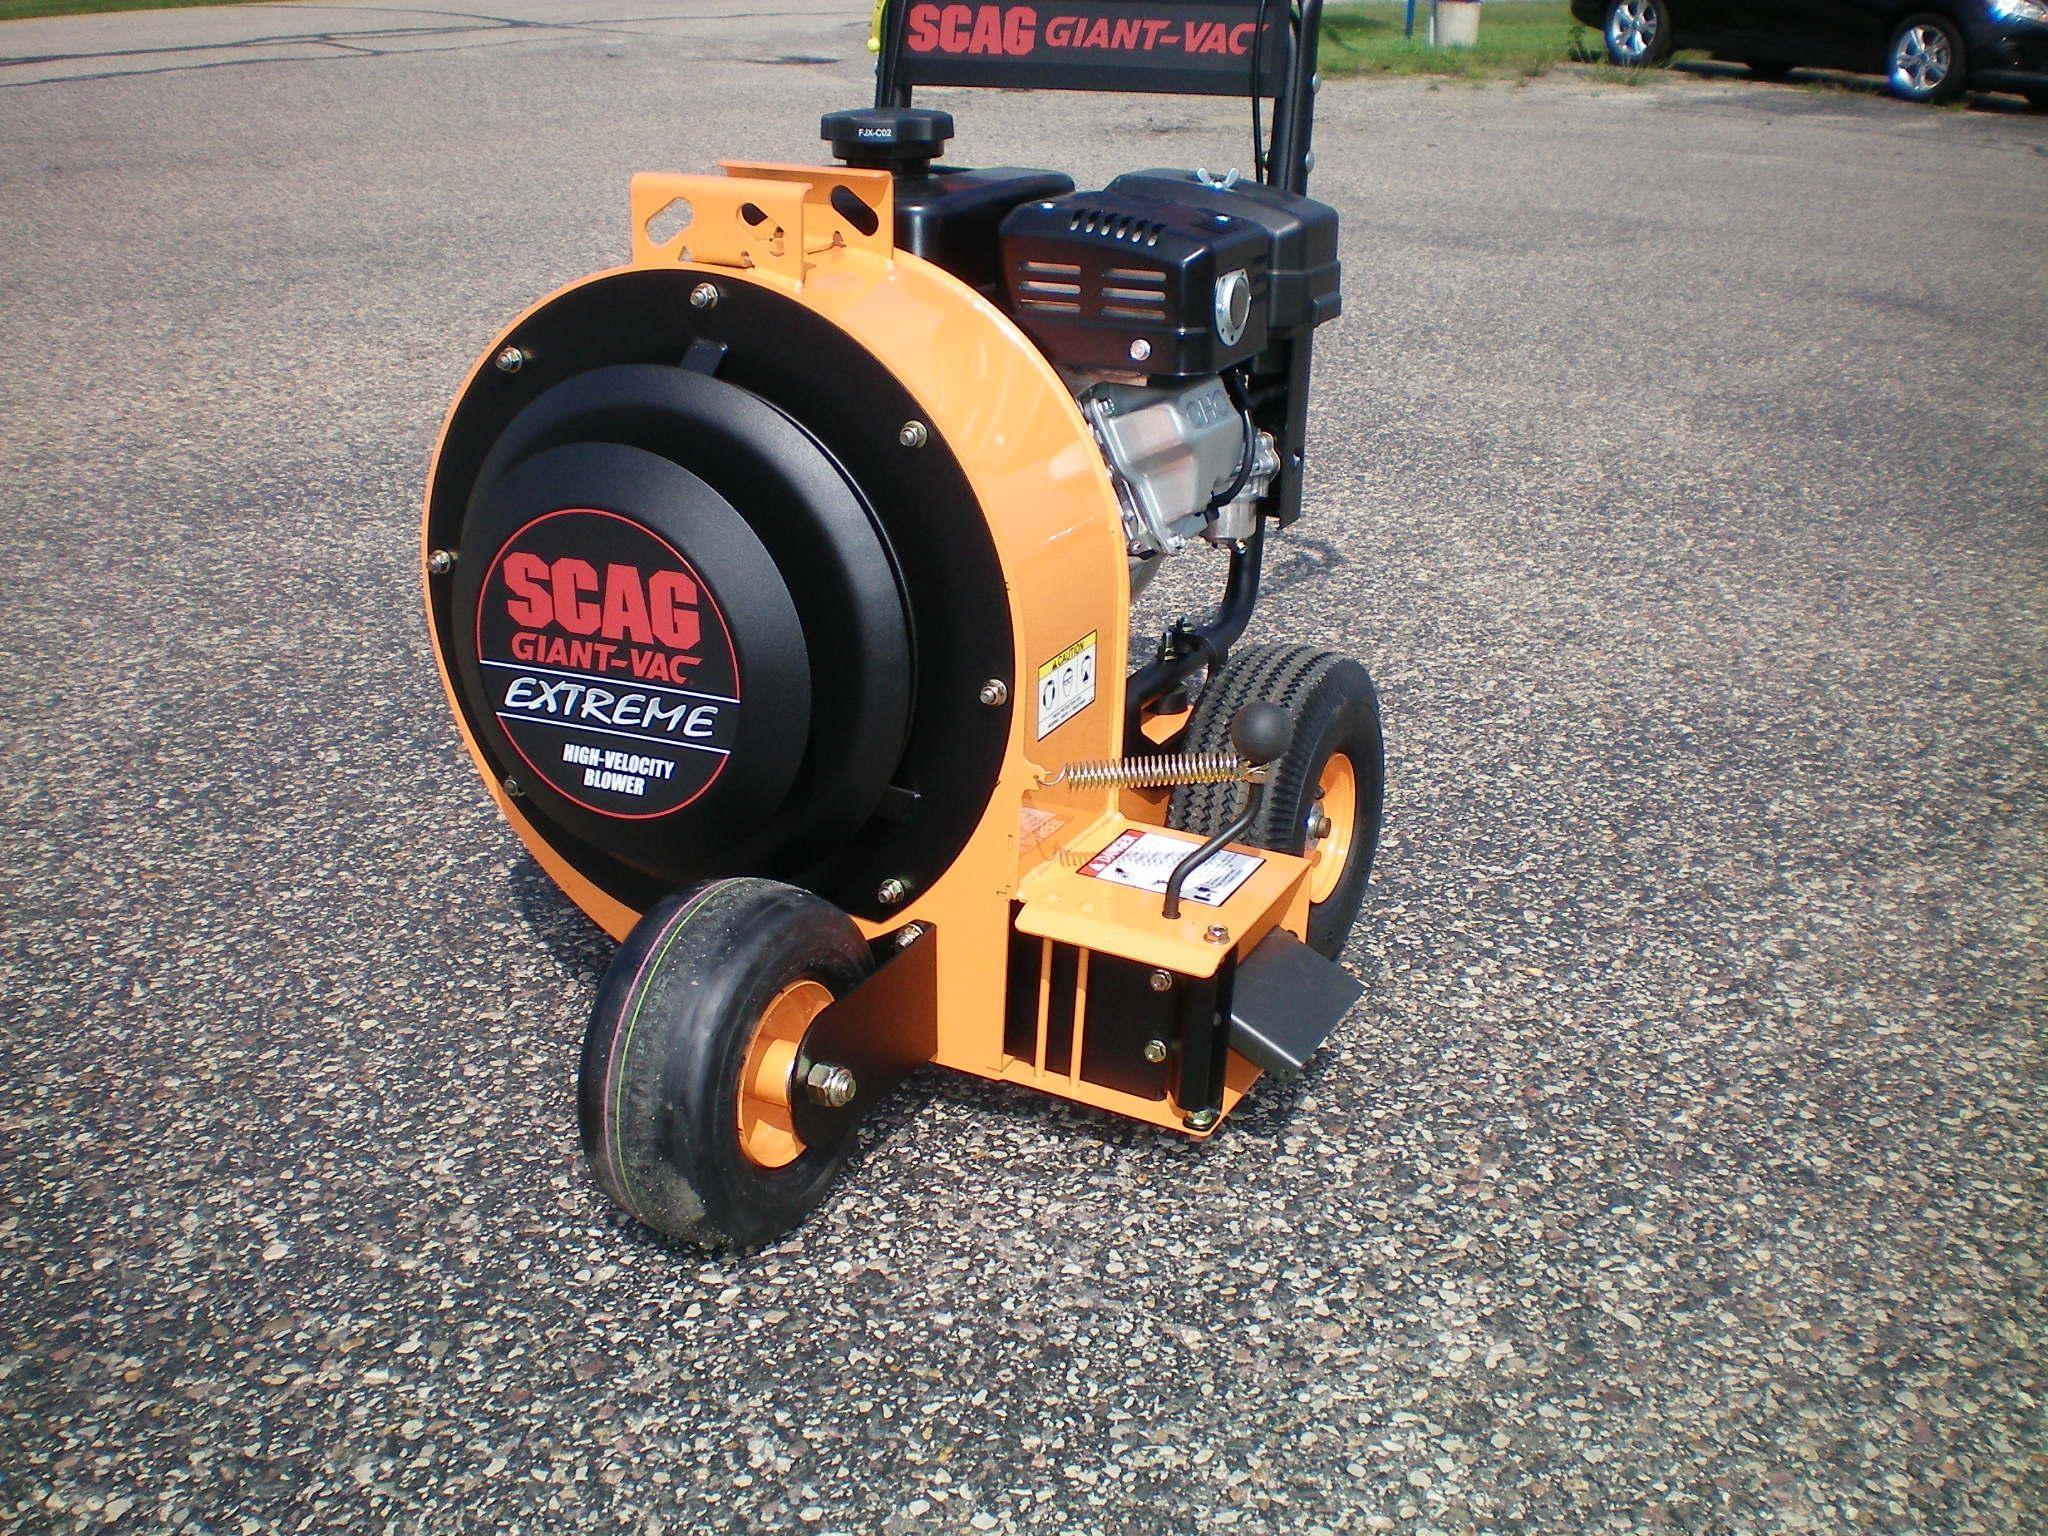 Scag Giant-Vac LBX15-EX27 Lawn and Garden